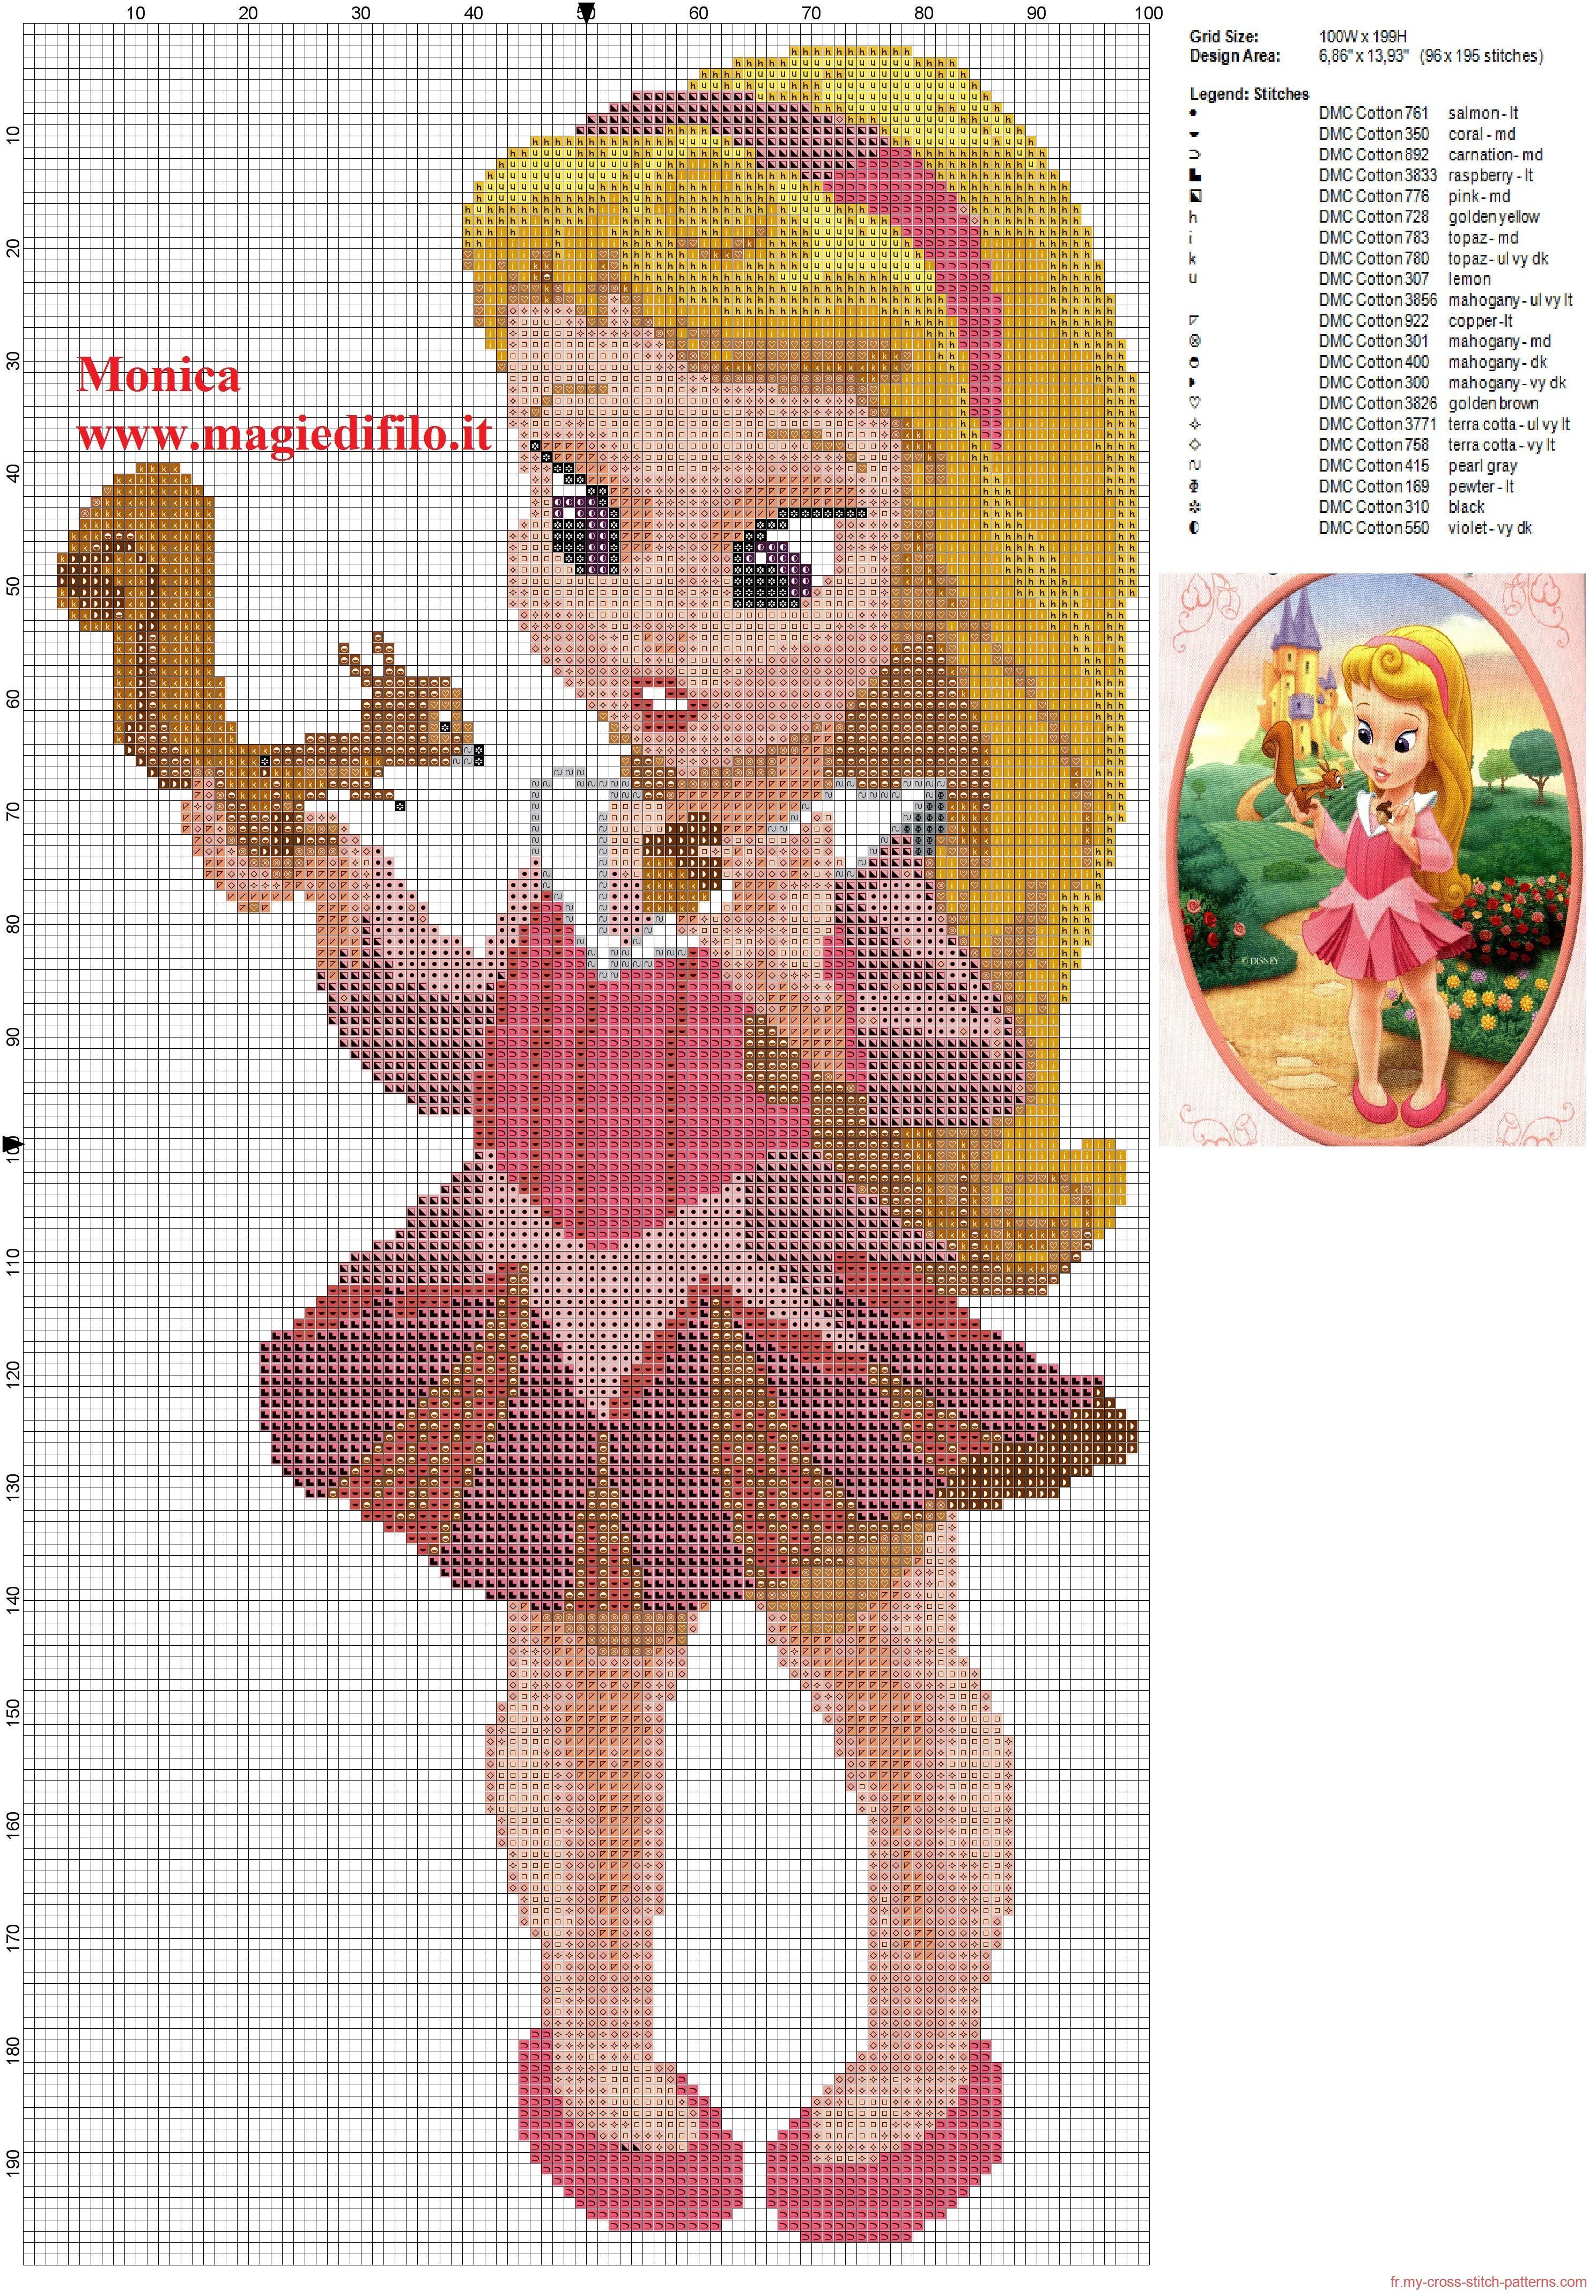 Petite princesse aurore grille point de croix 2976x4280 5683171 cross stitch cr ations - Petite princesse disney ...